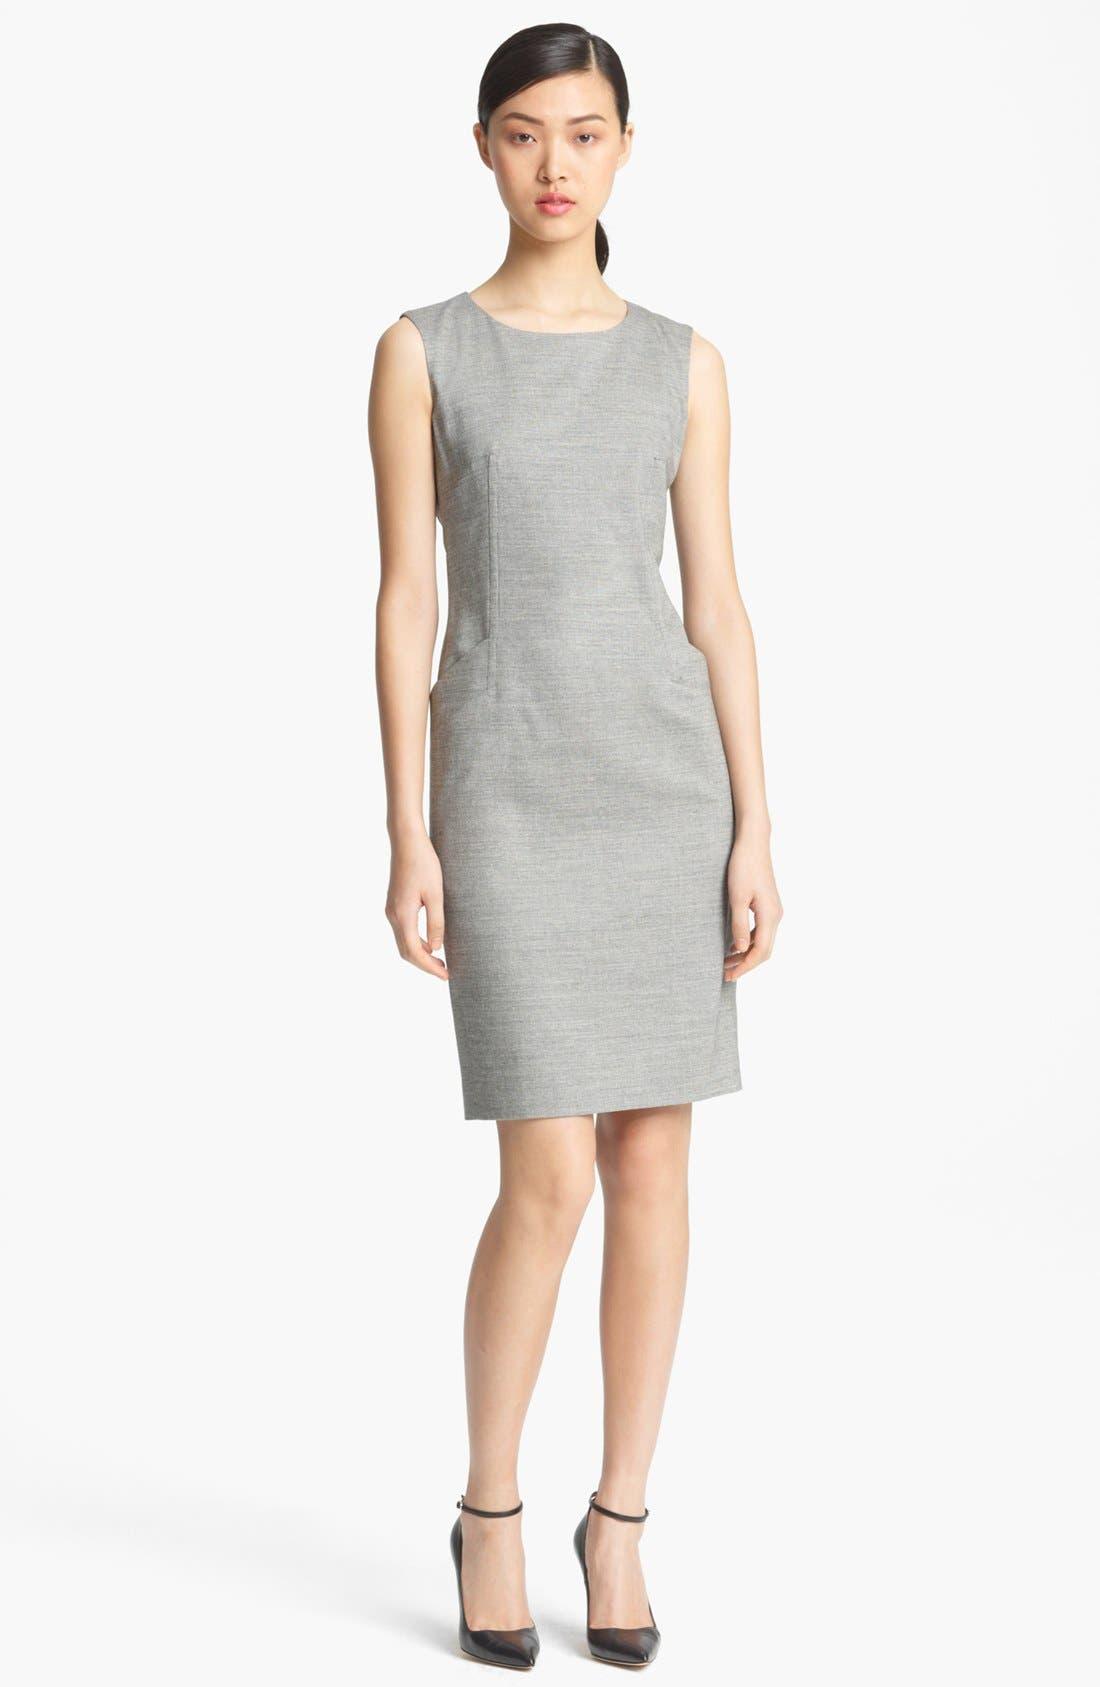 Main Image - Max Mara 'Albi' Sleeveless Dress